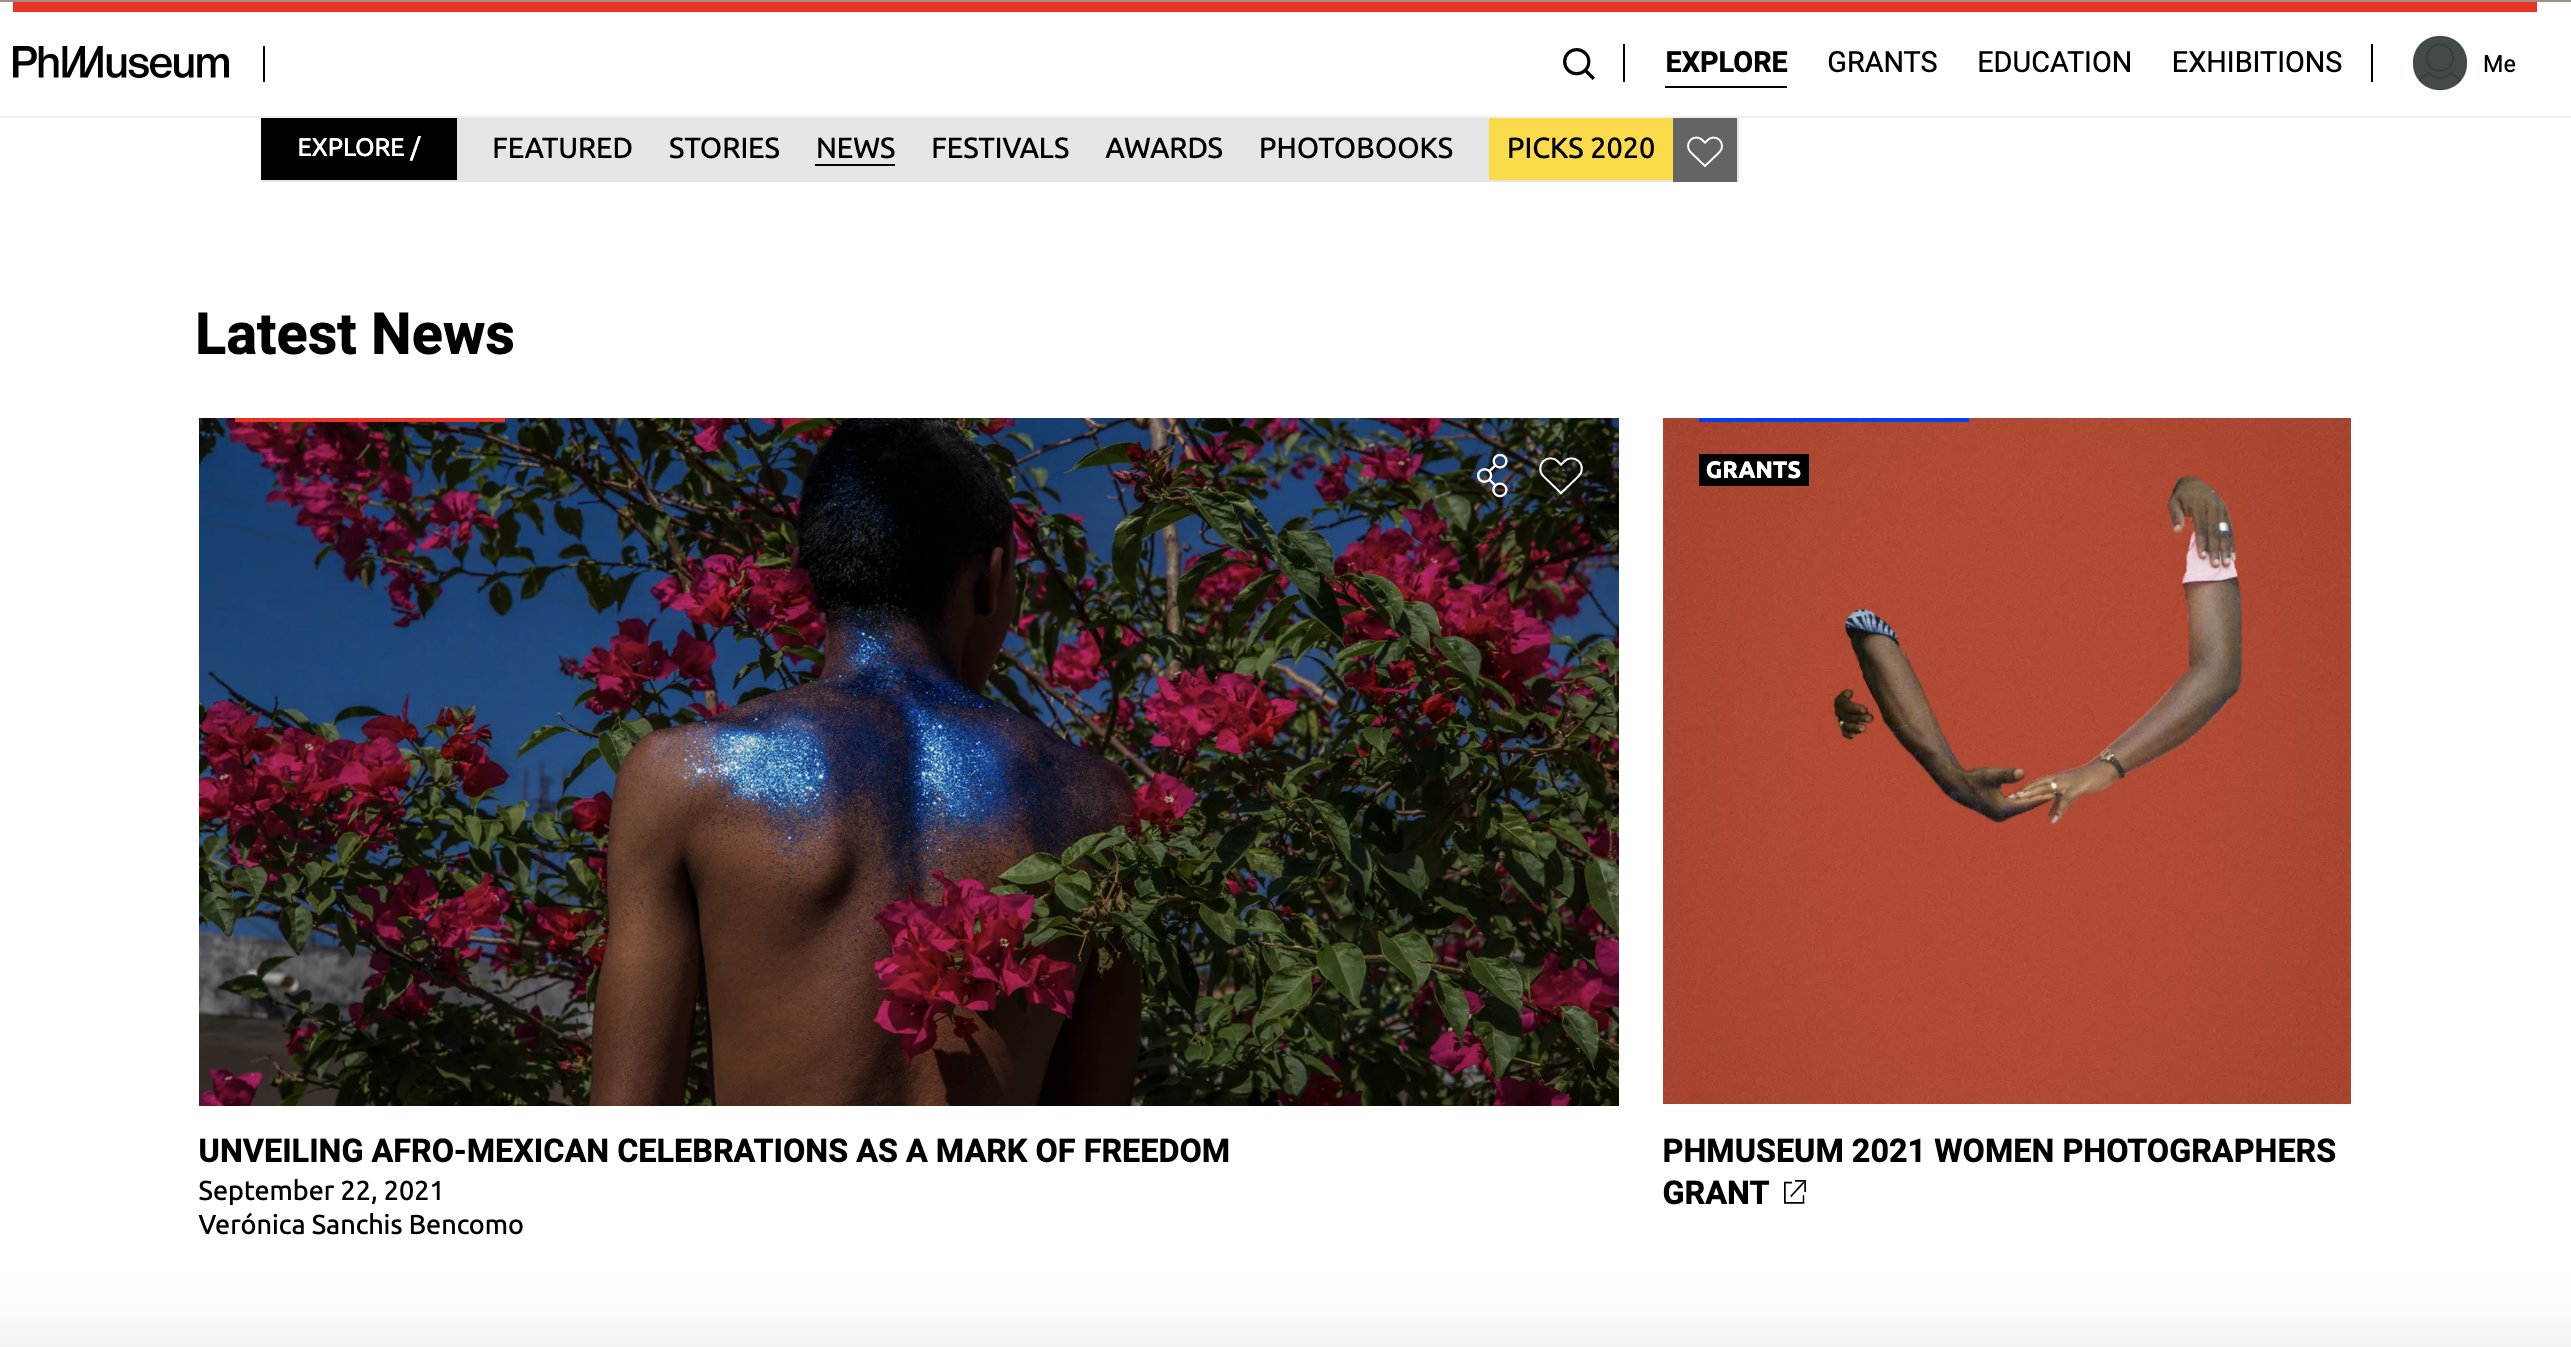 Art and Documentary Photography - Loading Captura_de_Pantalla_2021-09-23_a_la(s)_22.15.40.png